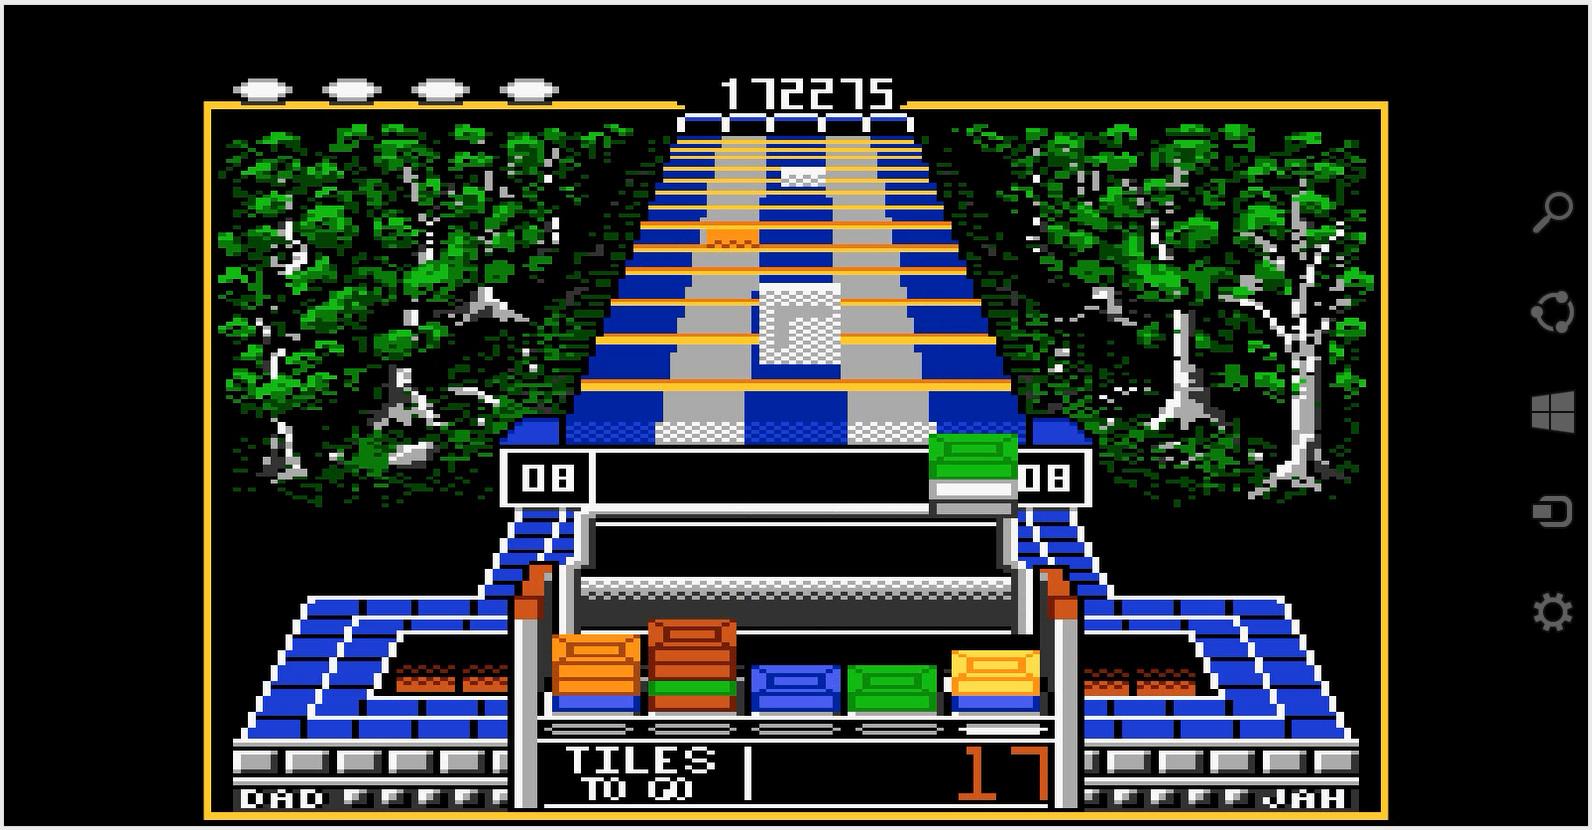 Scrabbler15: Klax: Normal [Level 06 Start] (Atari 7800 Emulated) 172,275 points on 2015-01-17 16:49:08